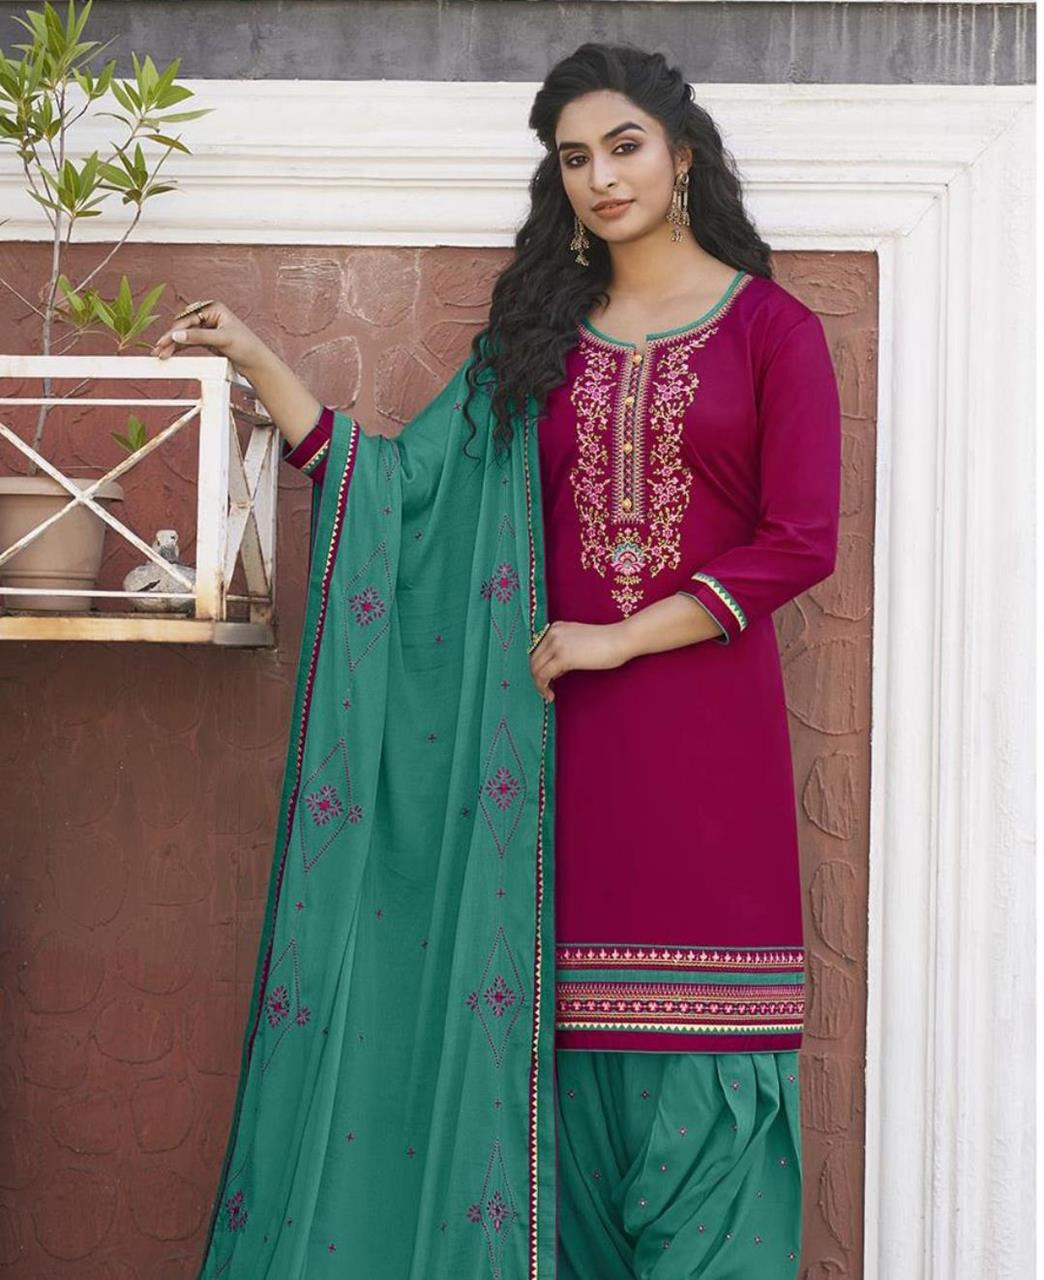 Zari Cotton Patiyala Suit Salwar in Dark Magenta